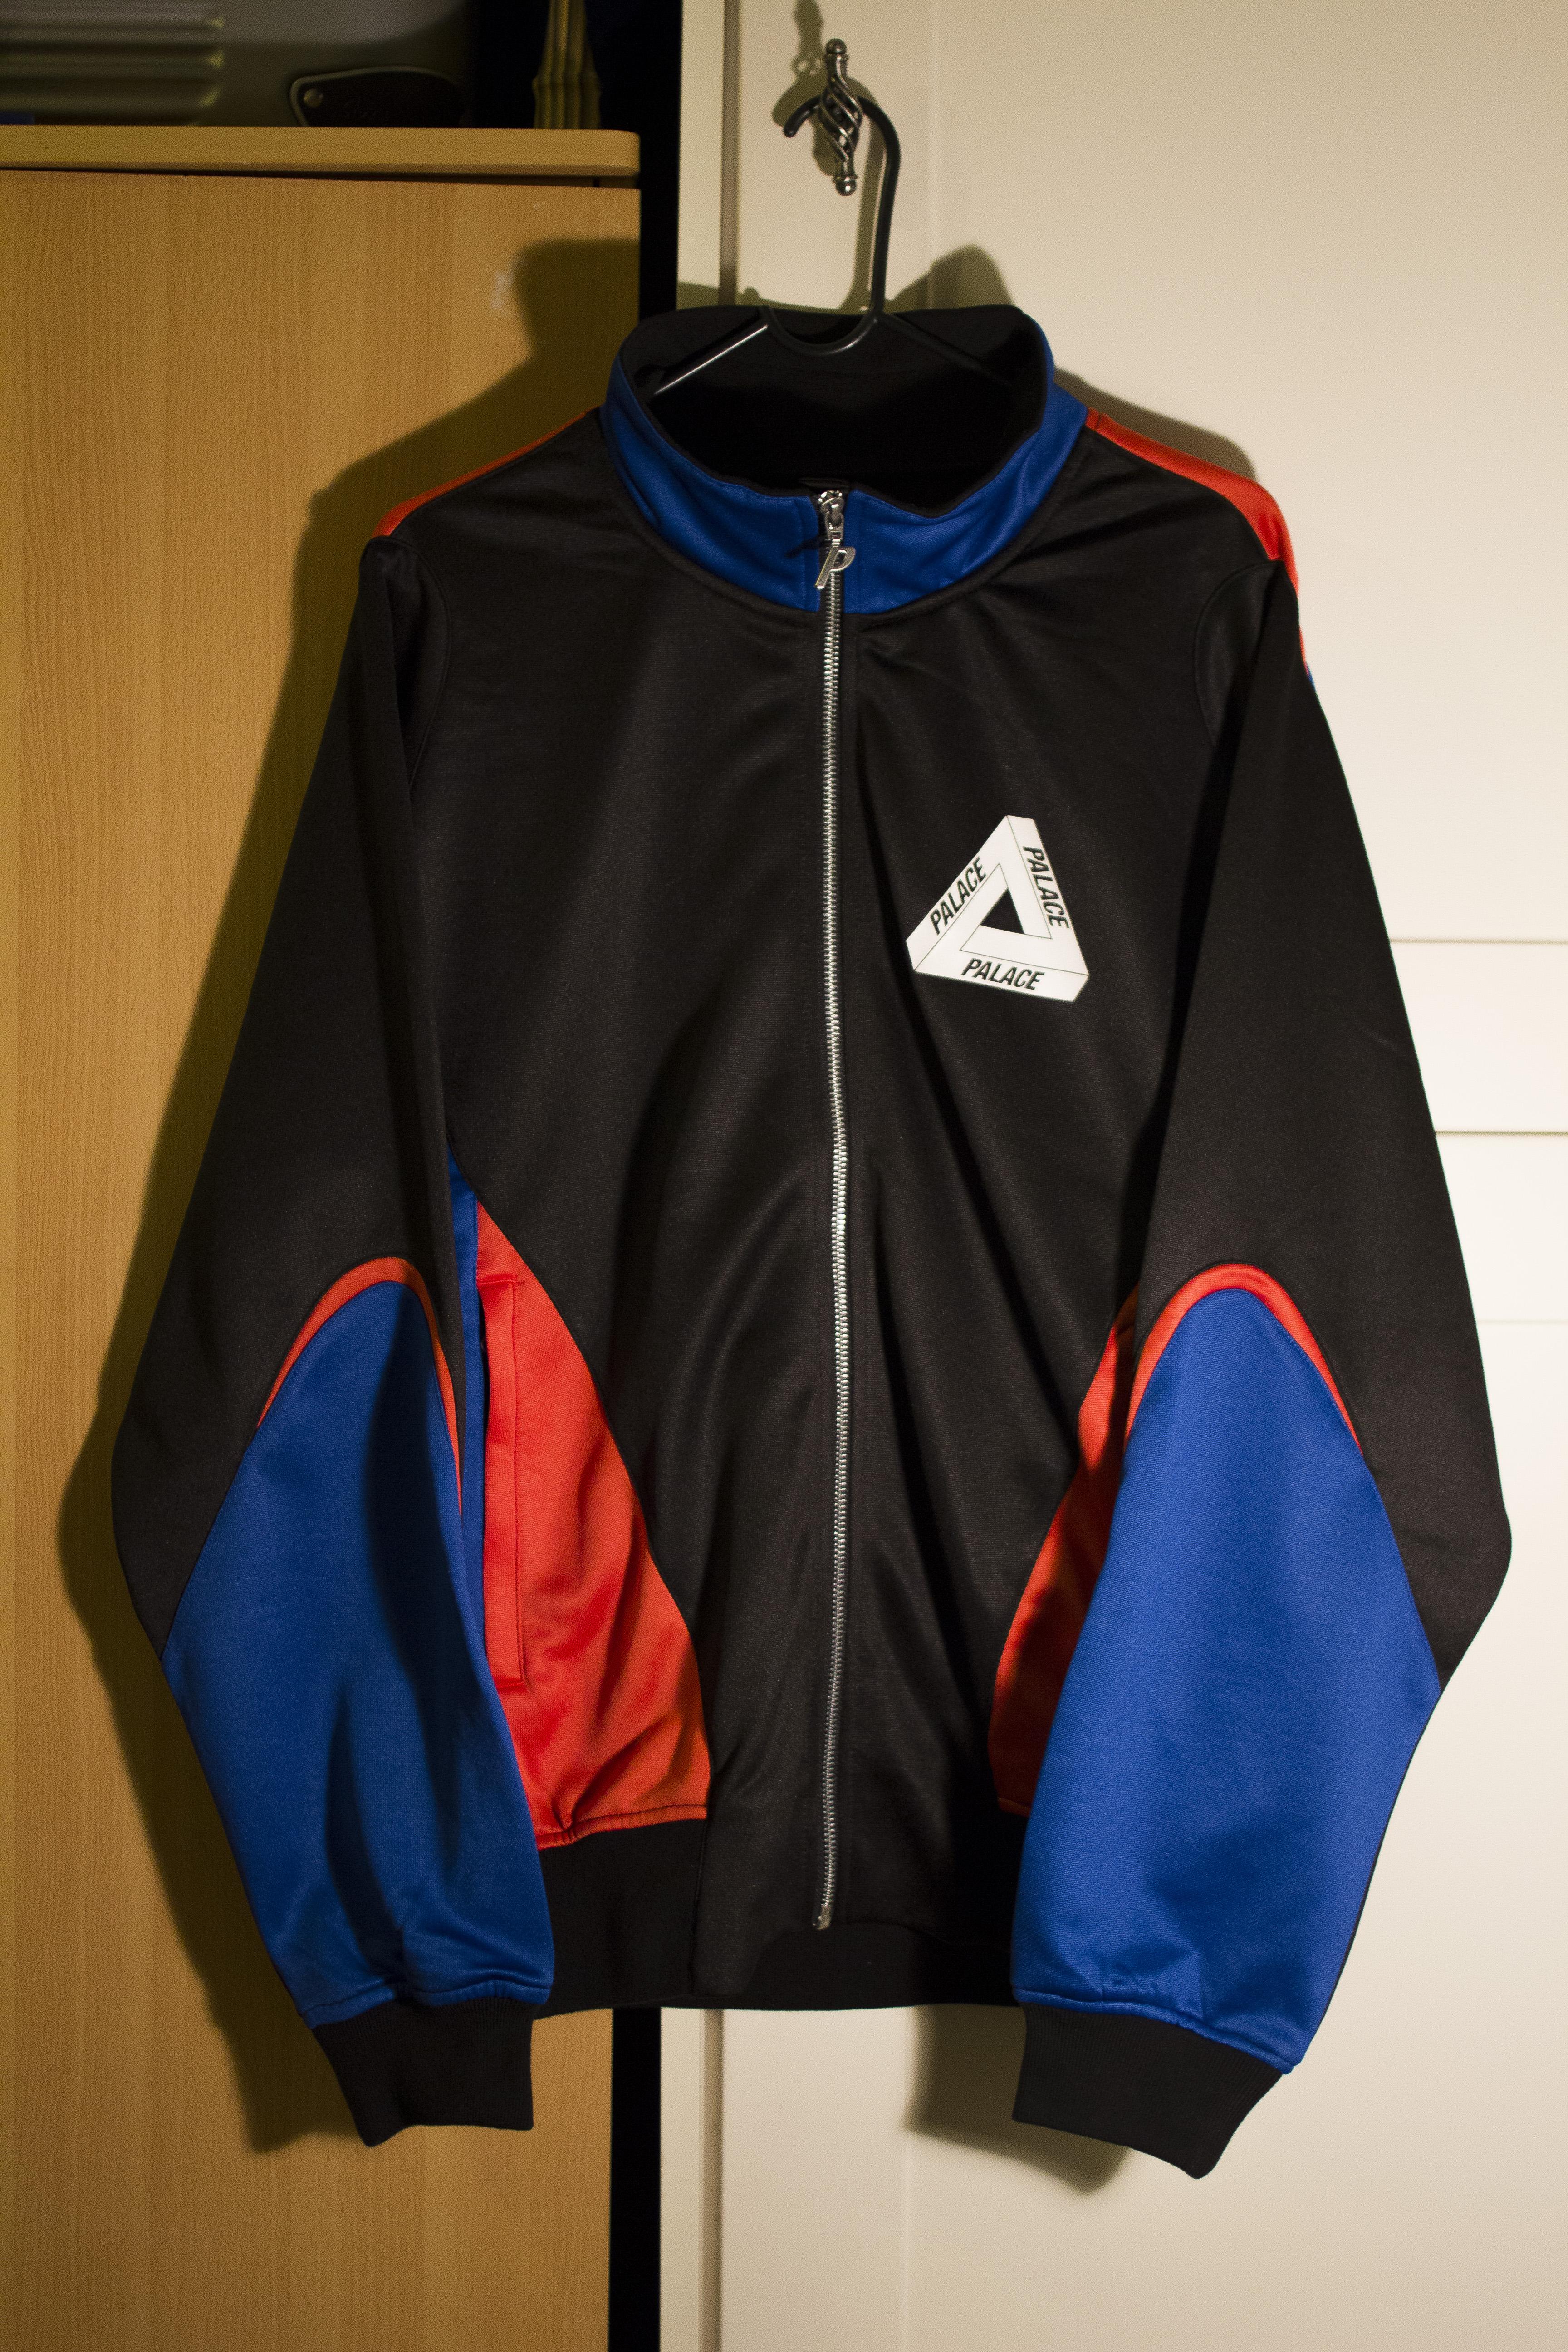 9831273fd5c6 Palace P-KNIT TRI FUNNEL BLACK   ROYAL   CAYENNE Size m - Light Jackets for  Sale - Grailed